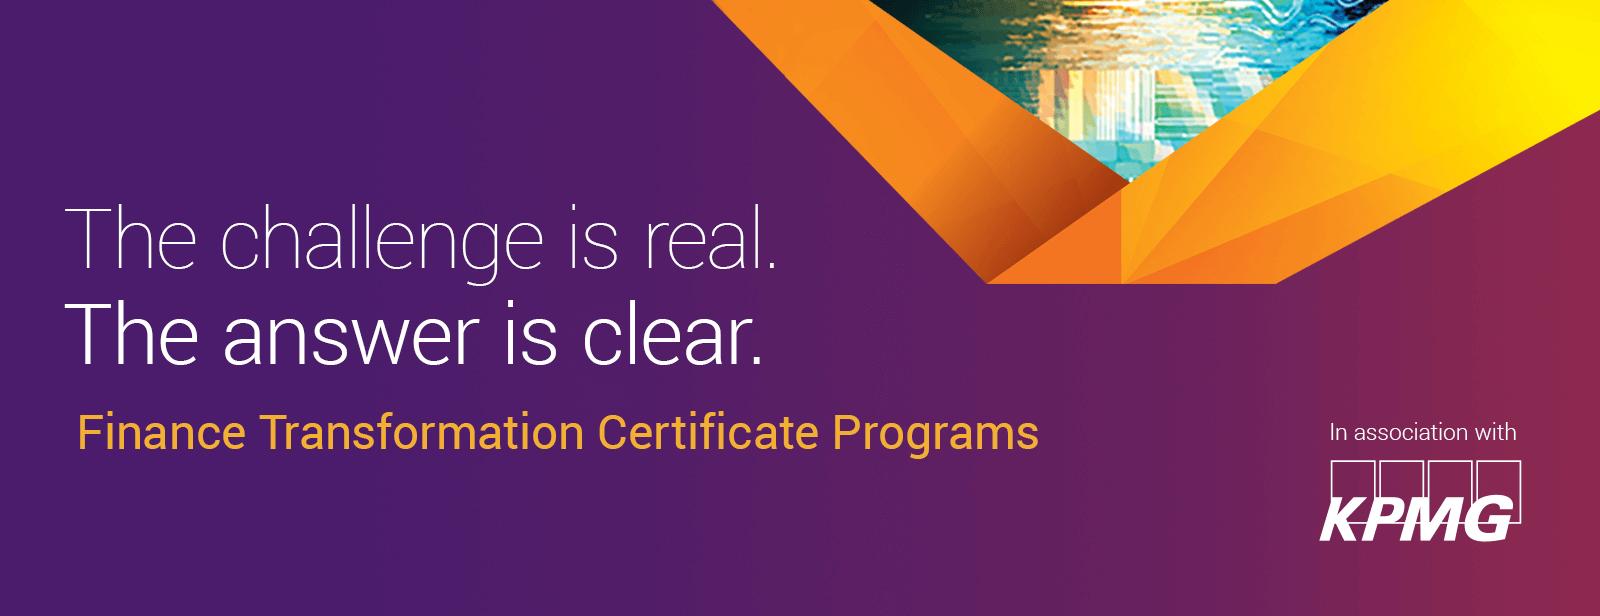 Finance Transformation Certificate Programs Aicpa Certificates